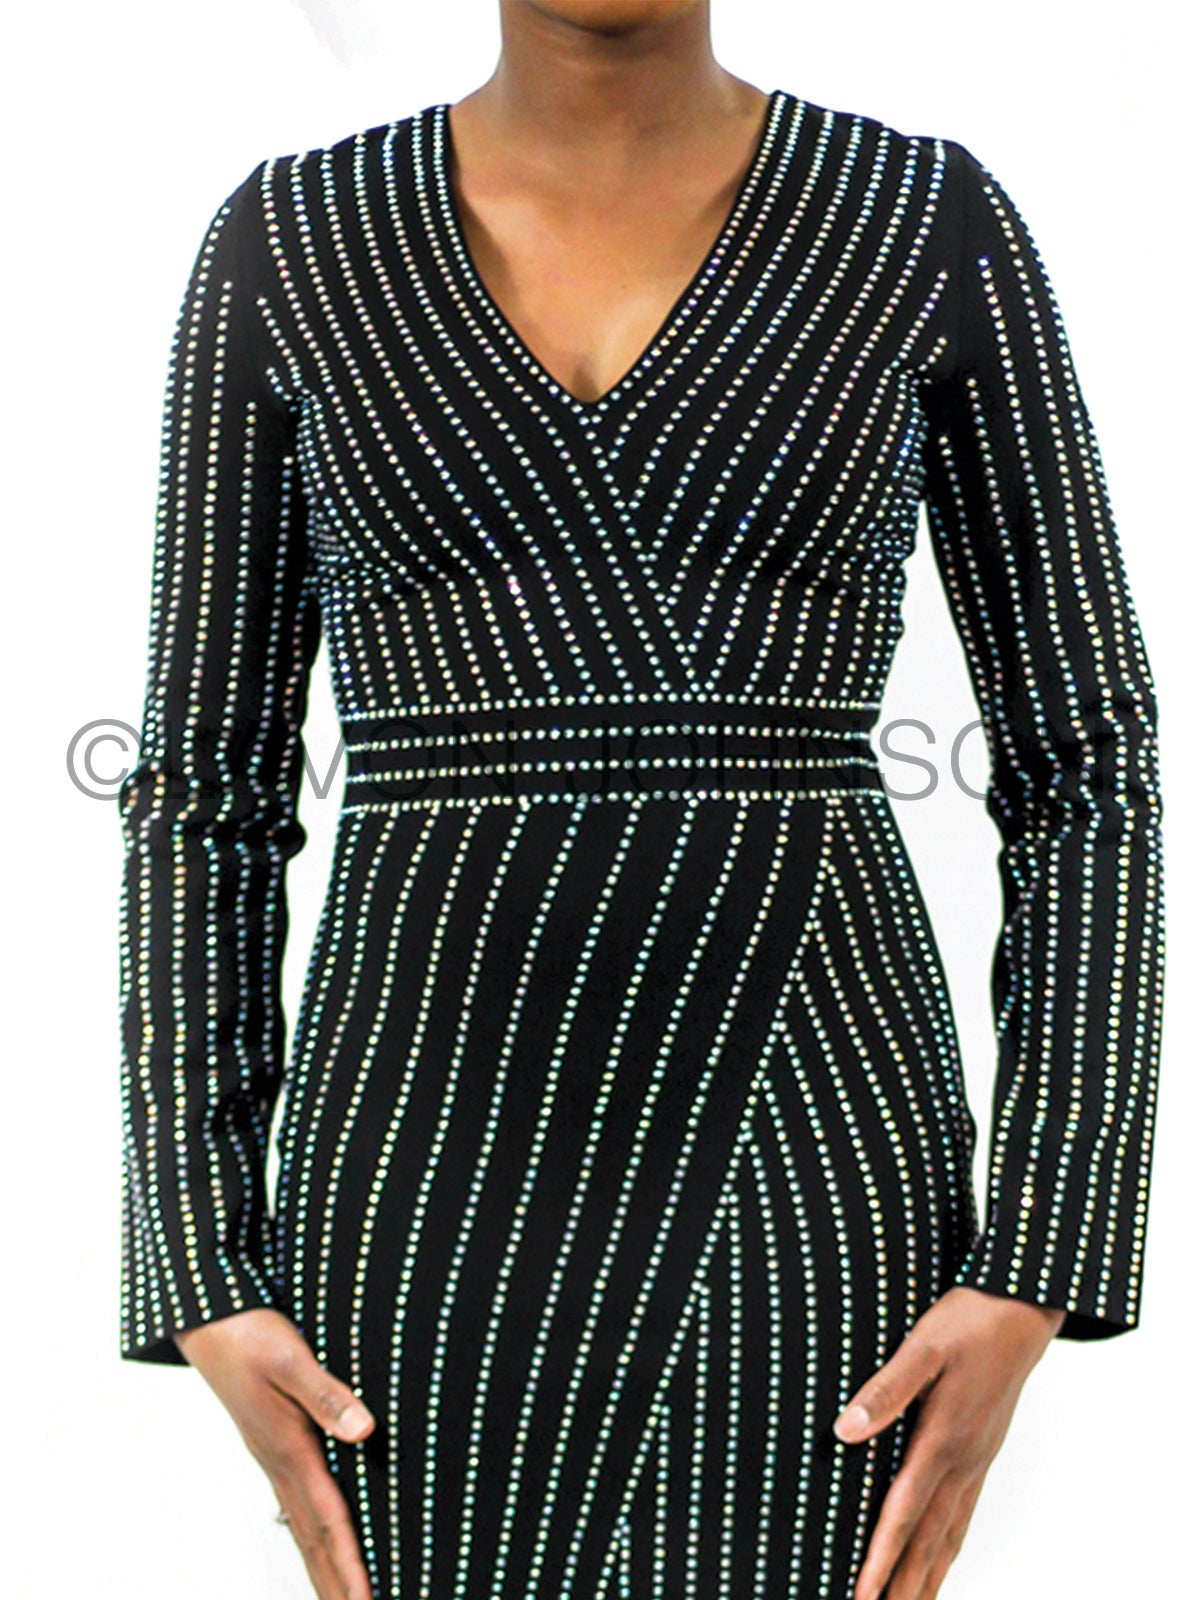 Image of Studded Rhinestone Dress/Top